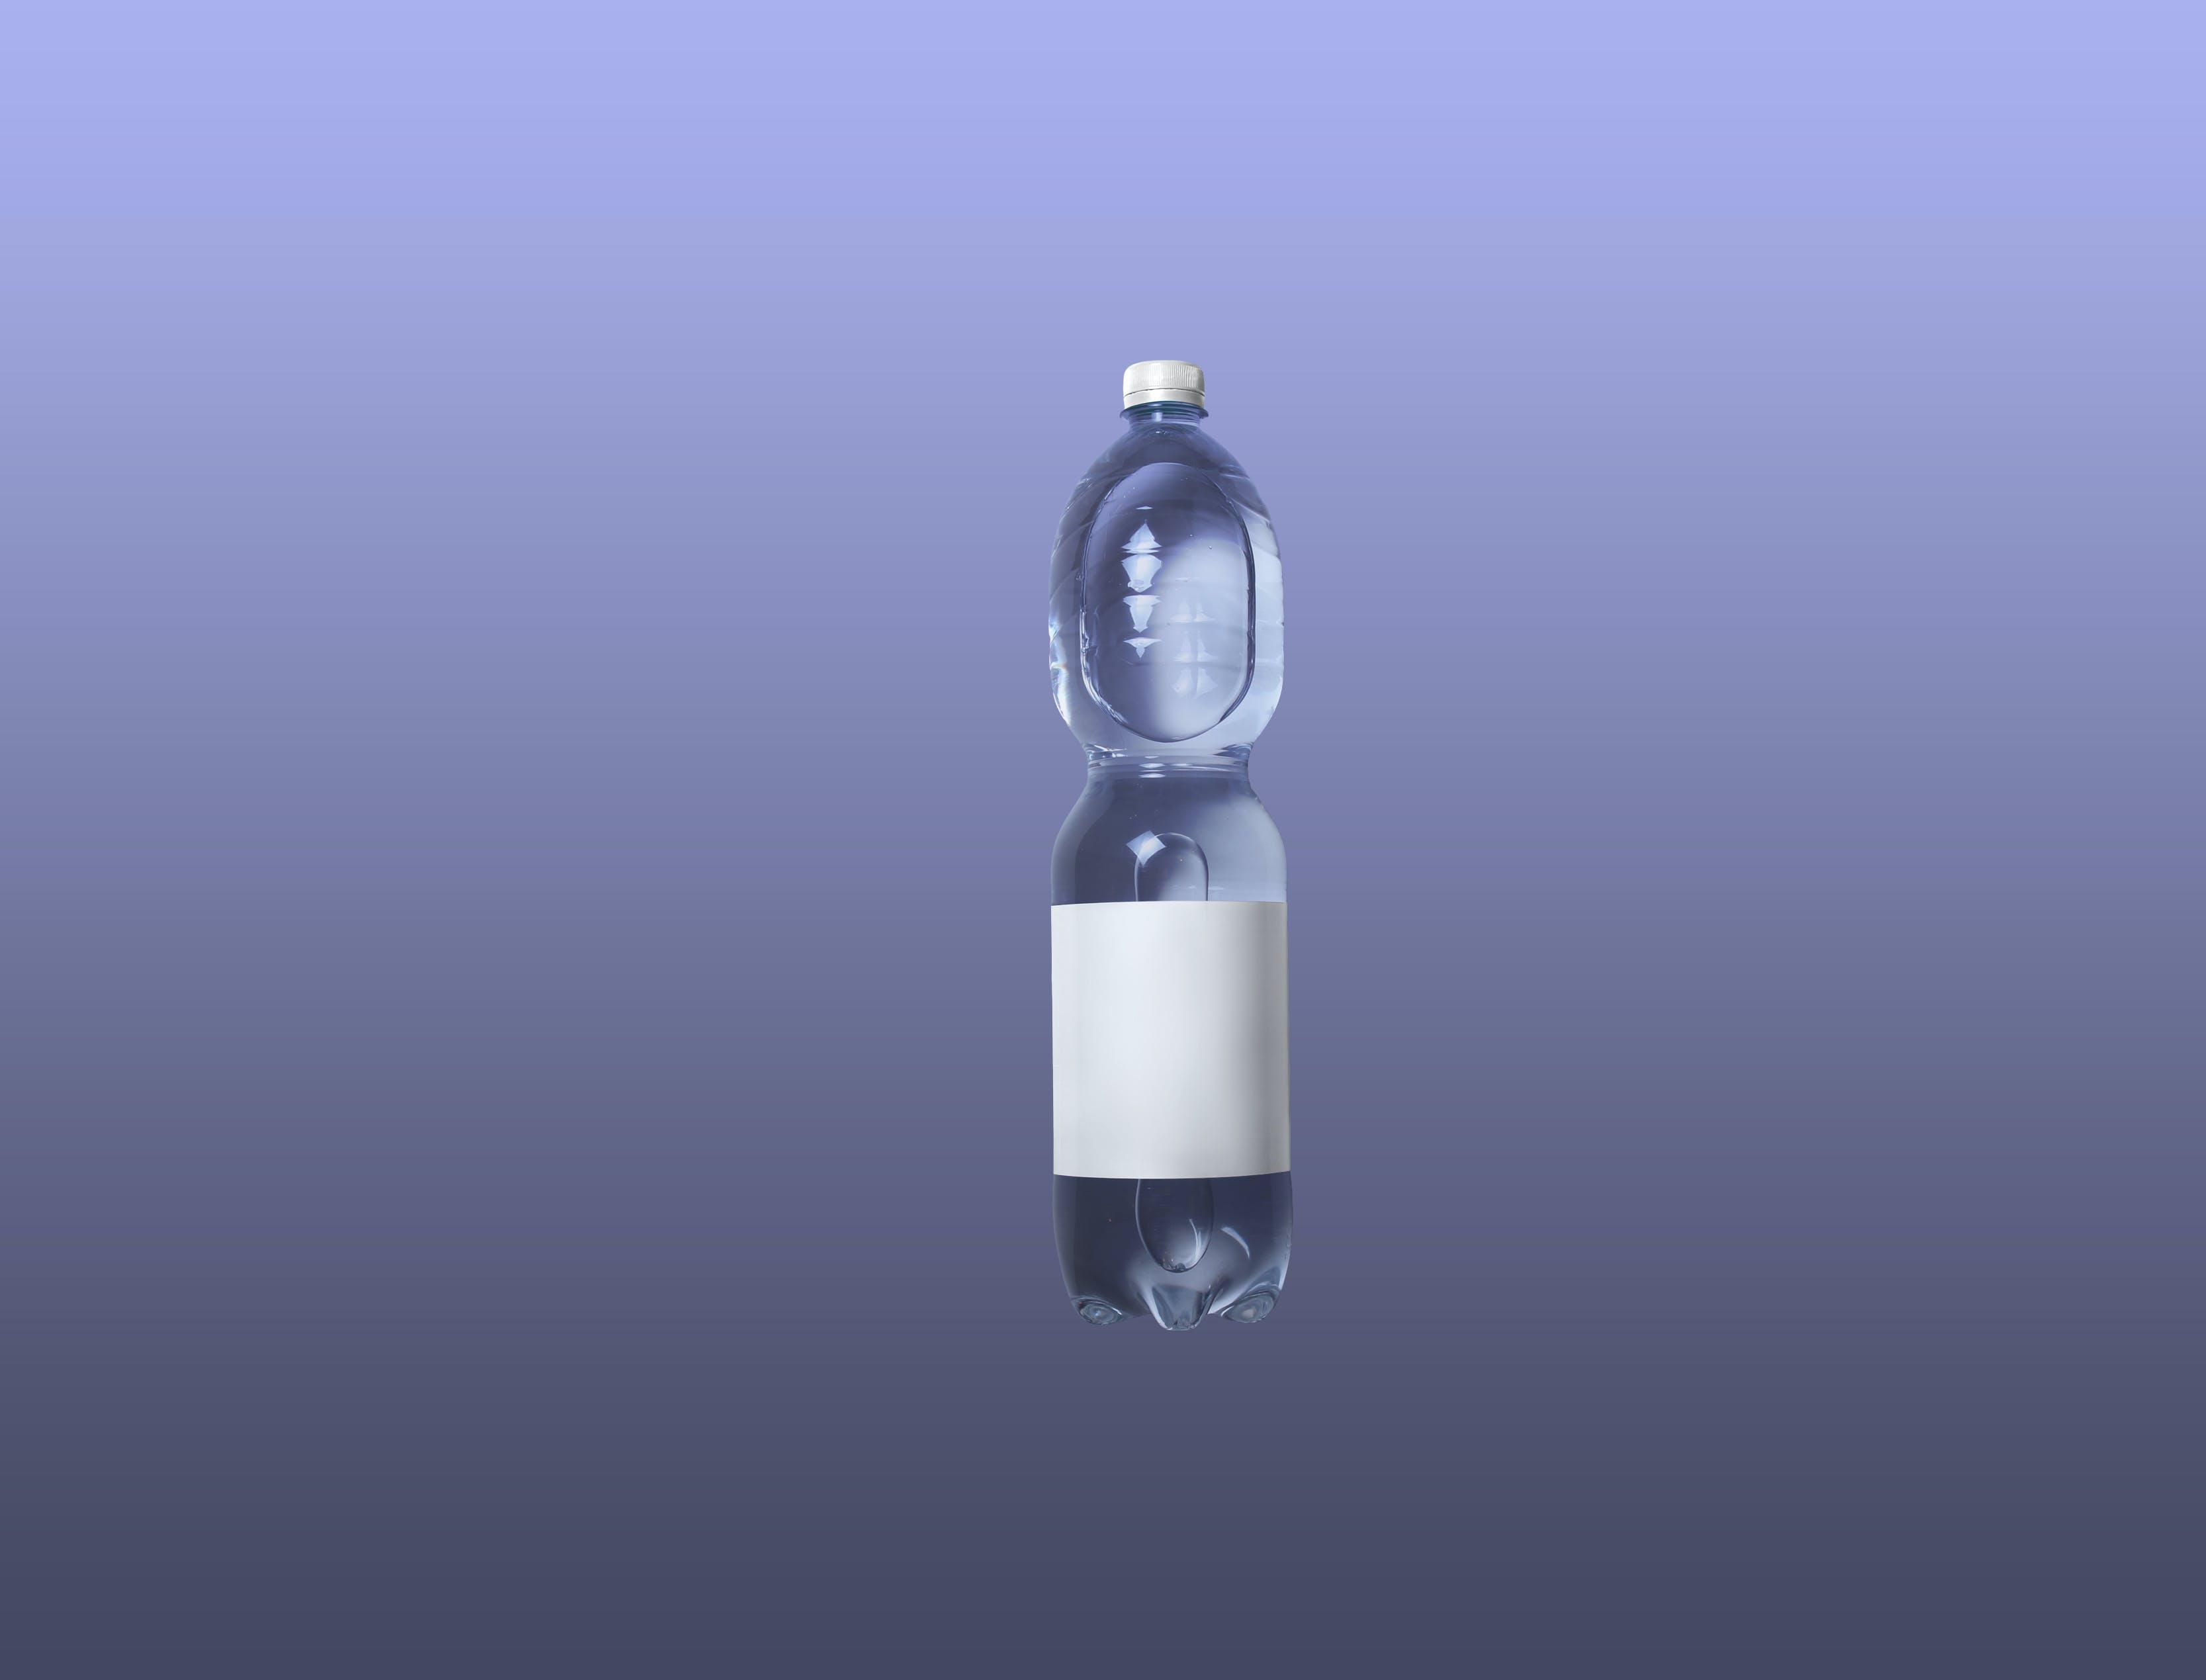 Free stock photo of bottle, drink, gradient, purple